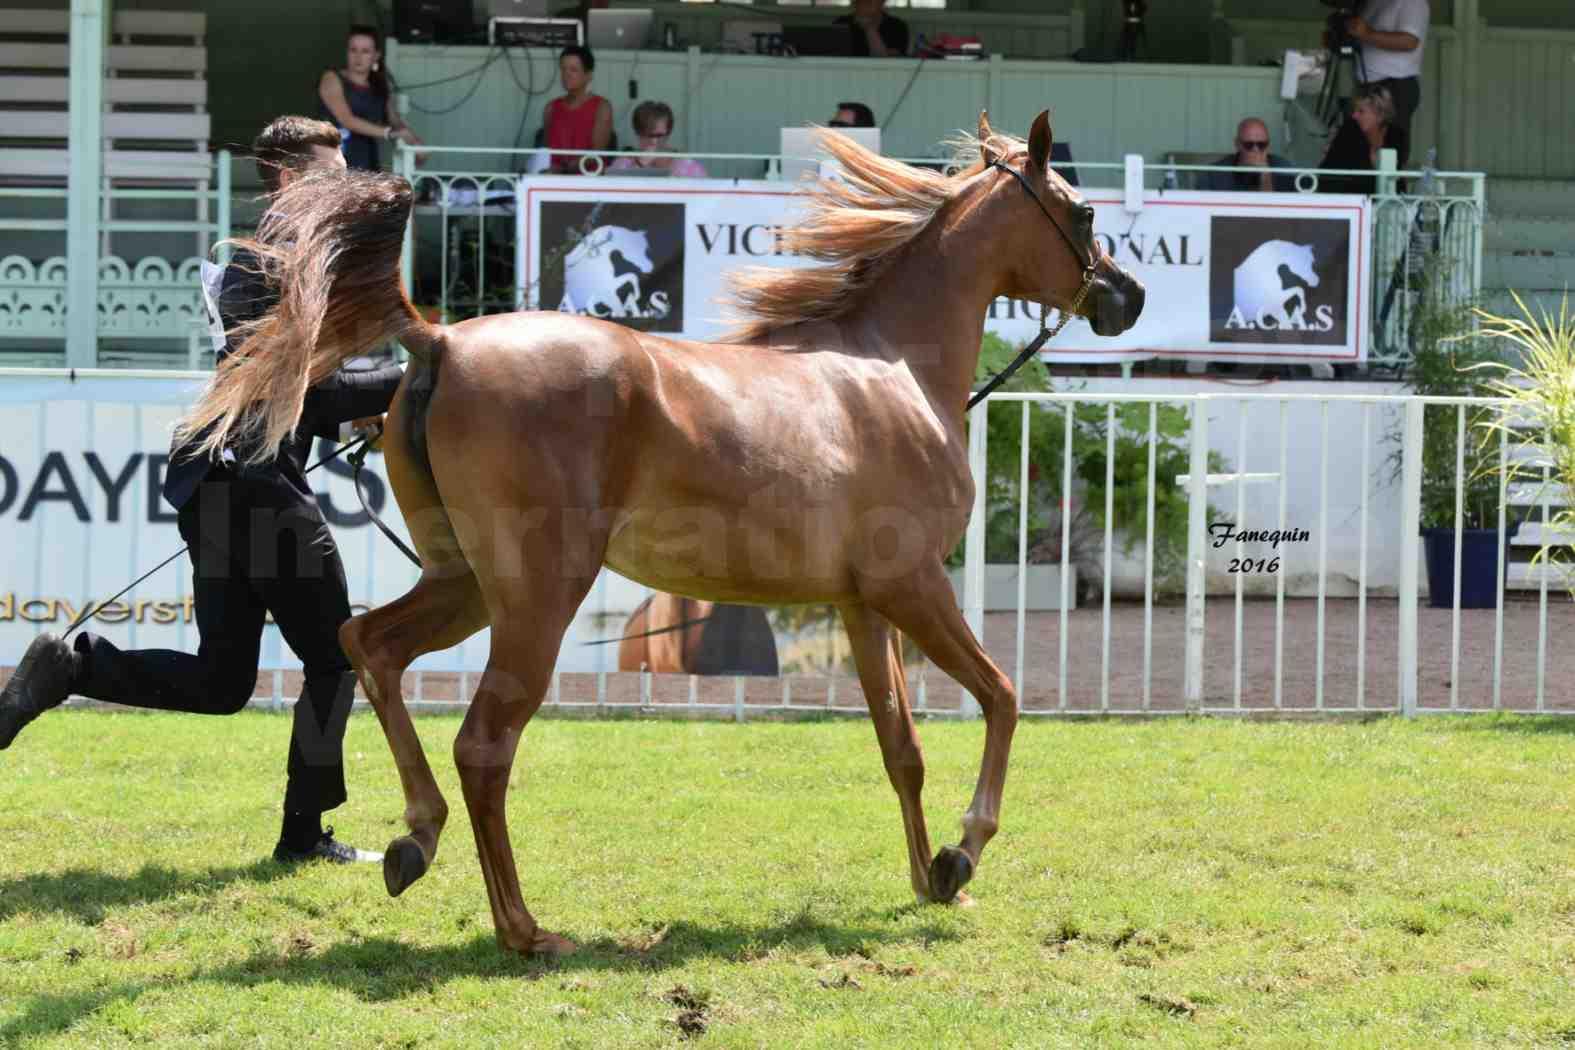 International Arabian Horse Show B de VICHY 2016 - JA FALAENE - Notre Sélection - 04